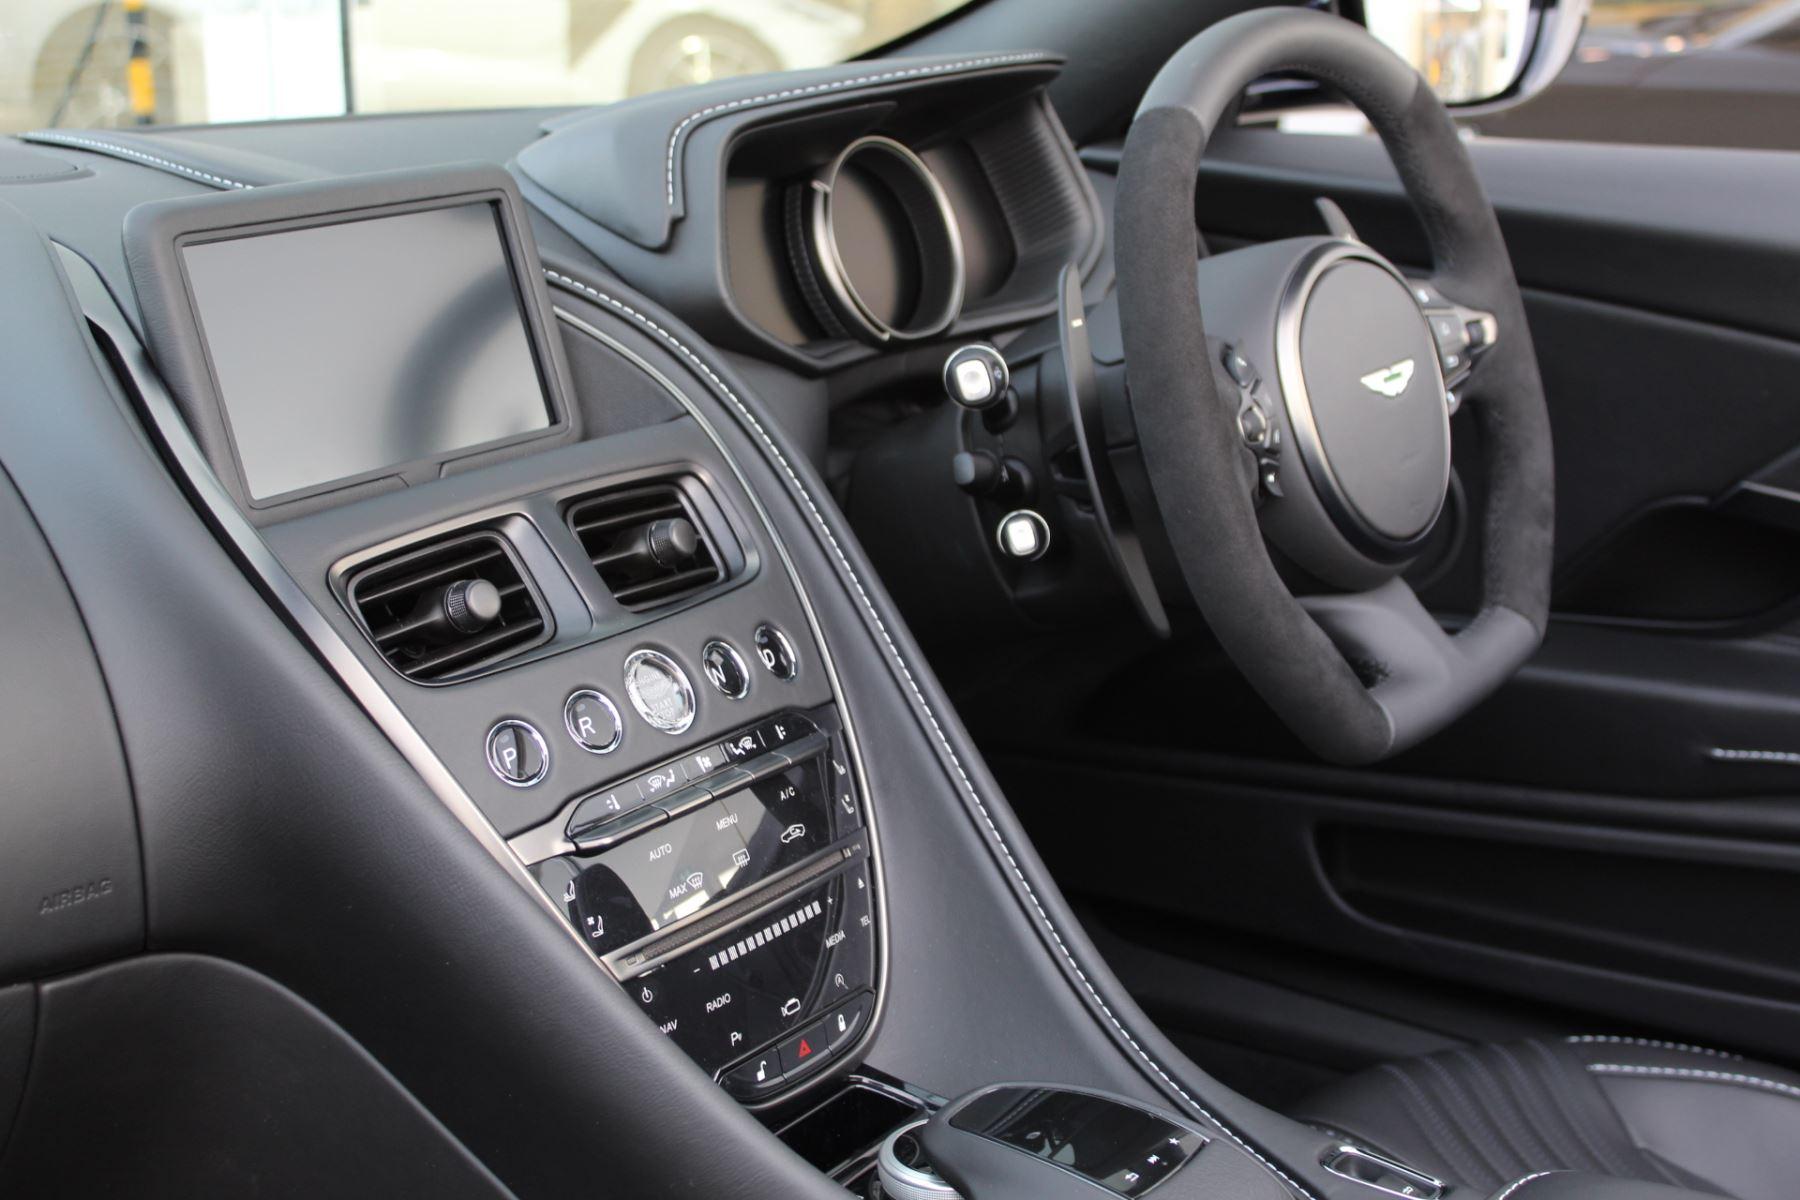 Aston Martin DB11 Volante V8 Volante 2dr Touchtronic image 6